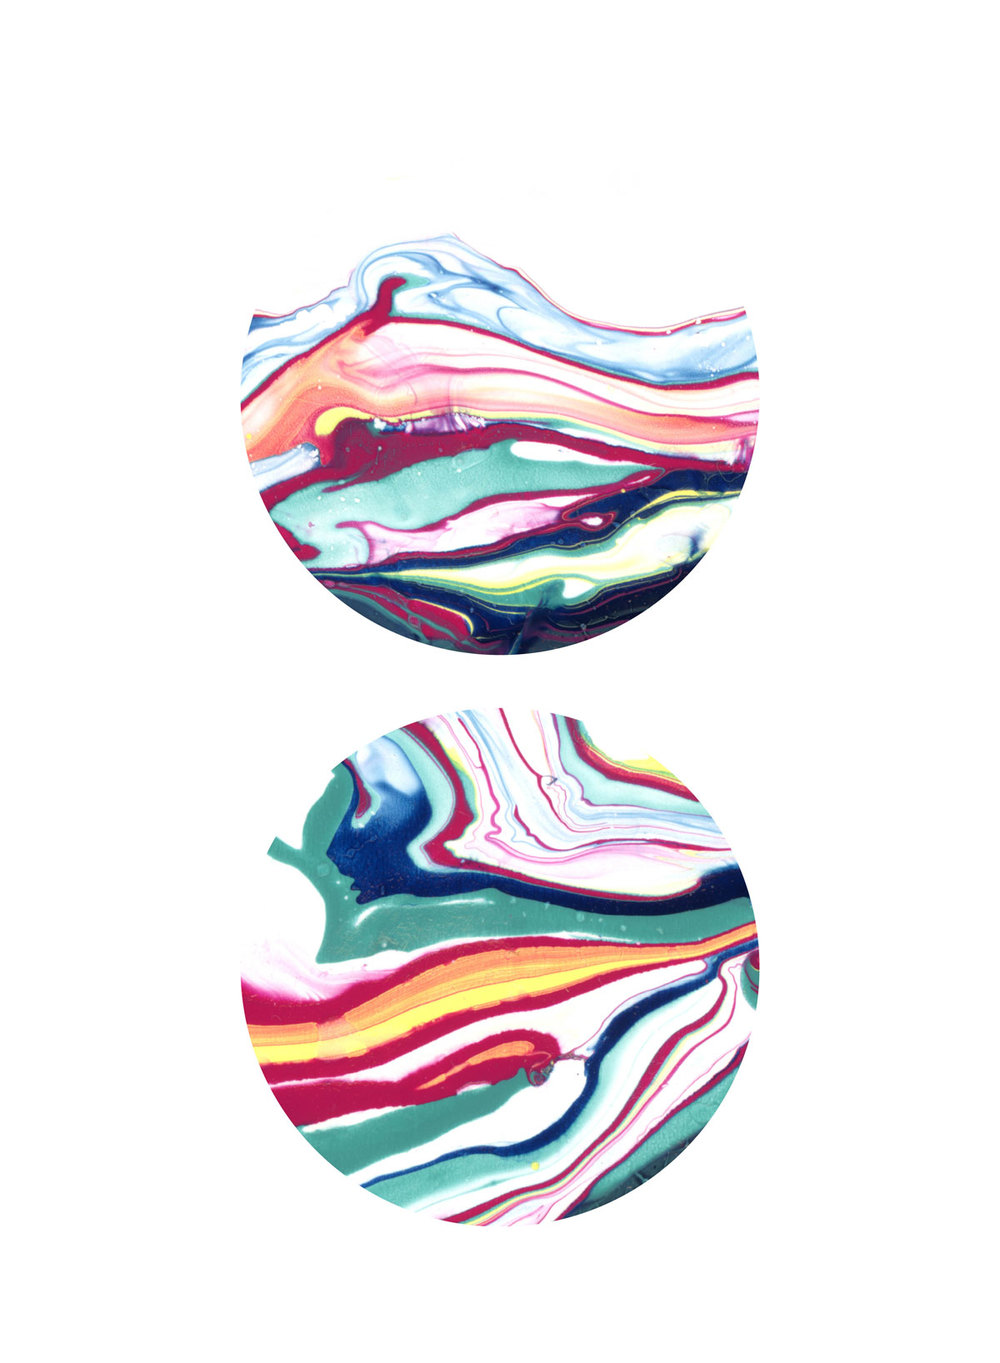 44-44x60-3.jpg